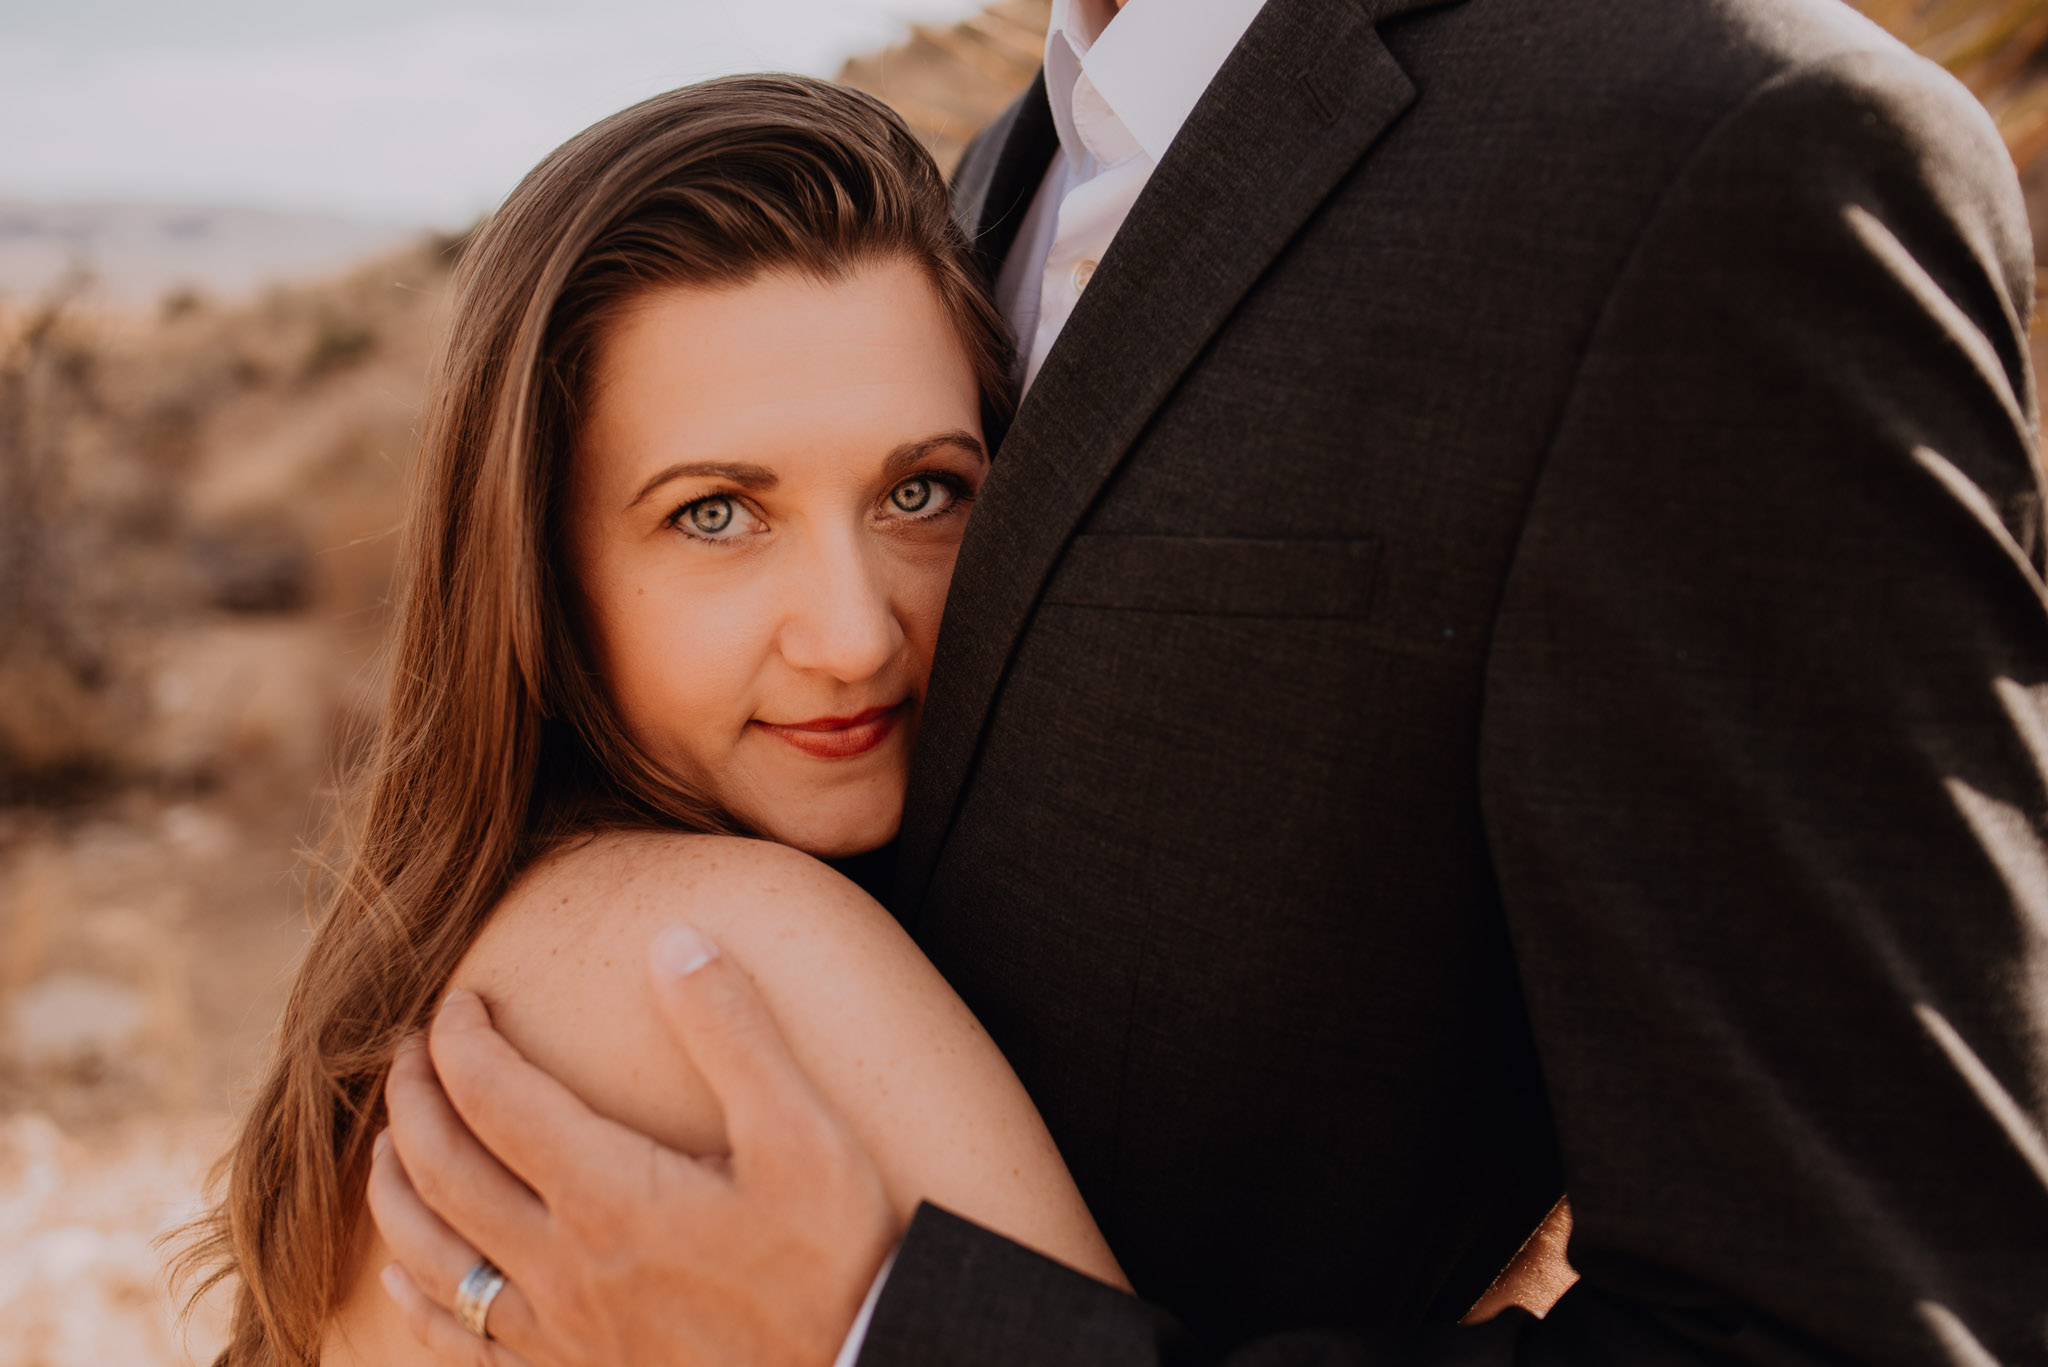 deset-elopement-big-bend-engagement-photos20.jpg